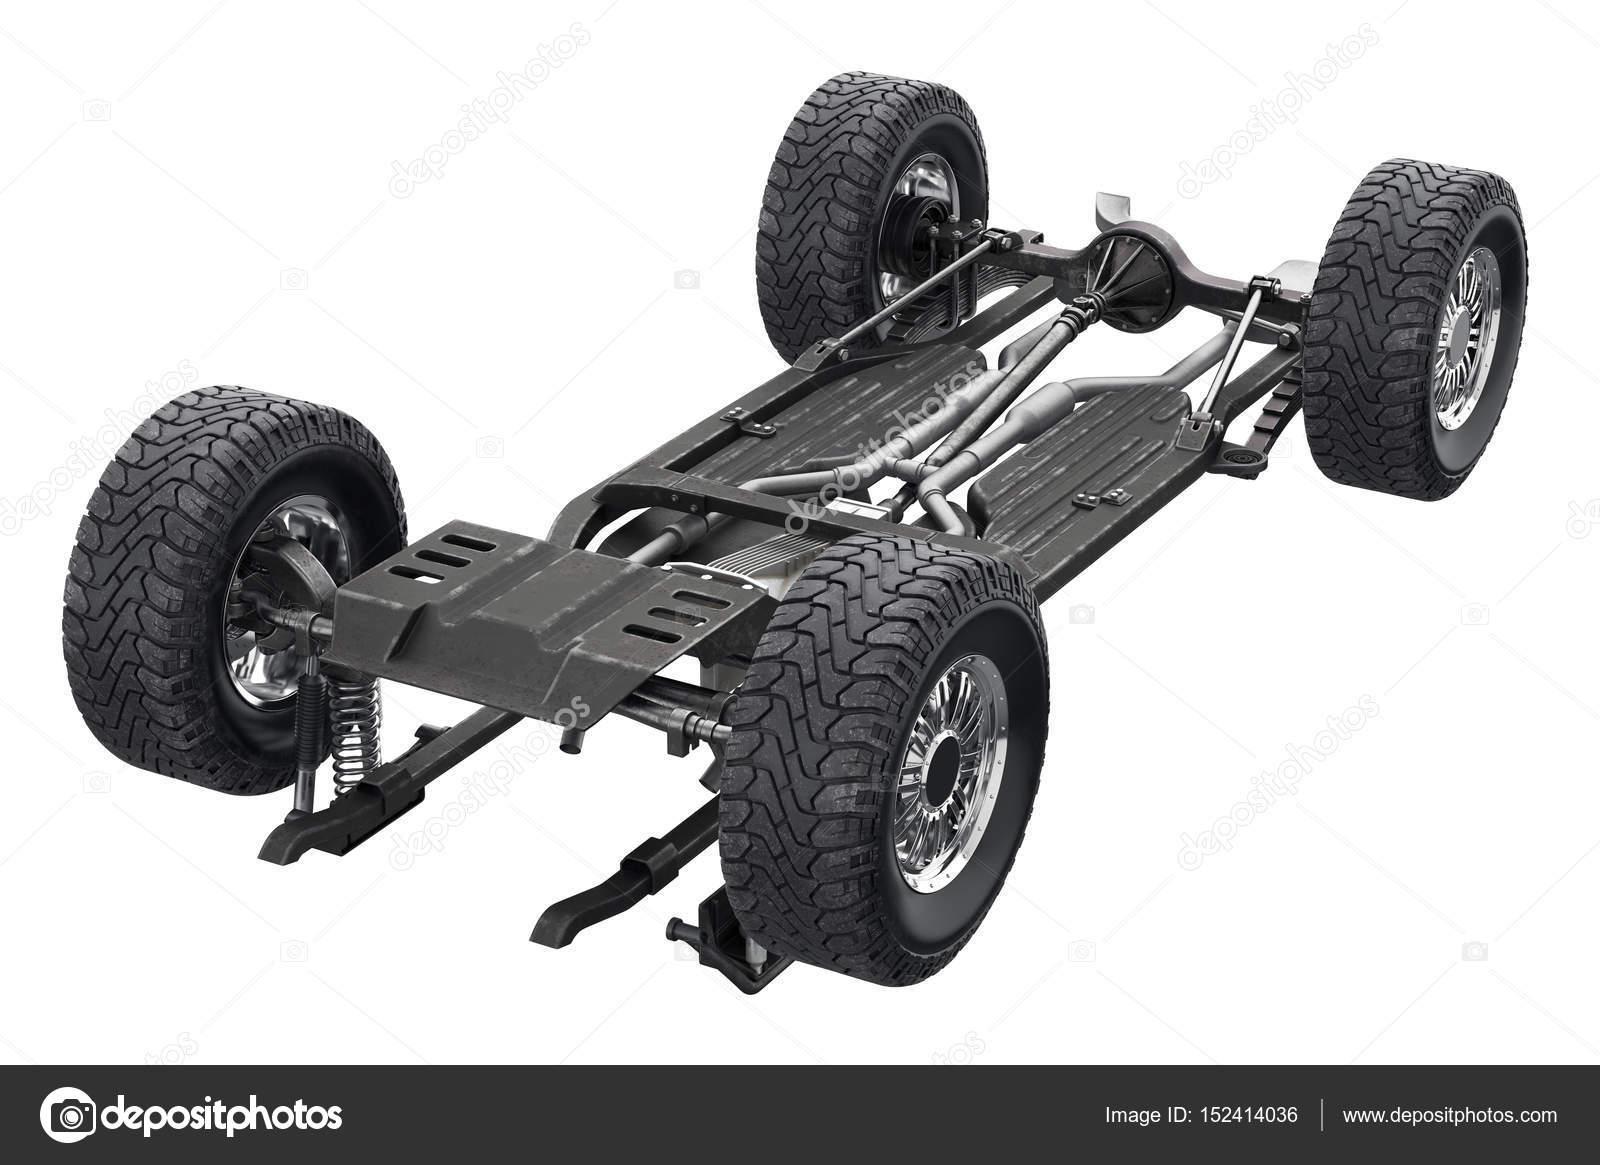 Chassis Rahmen Auto Fahrwerk — Stockfoto © ARTYuSTUDIO #152414036